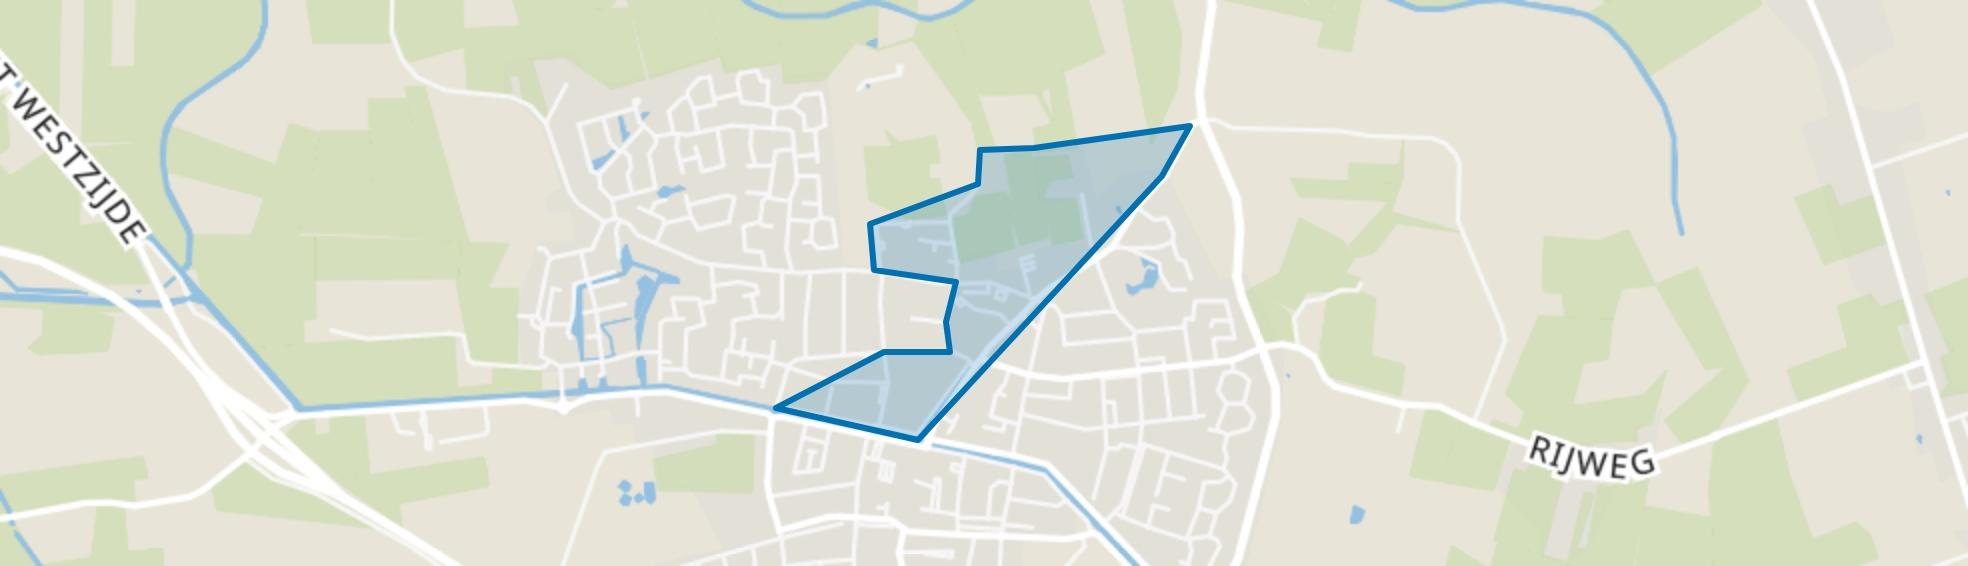 Oosterwolde-Centrum-Noord-West, Oosterwolde (FR) map